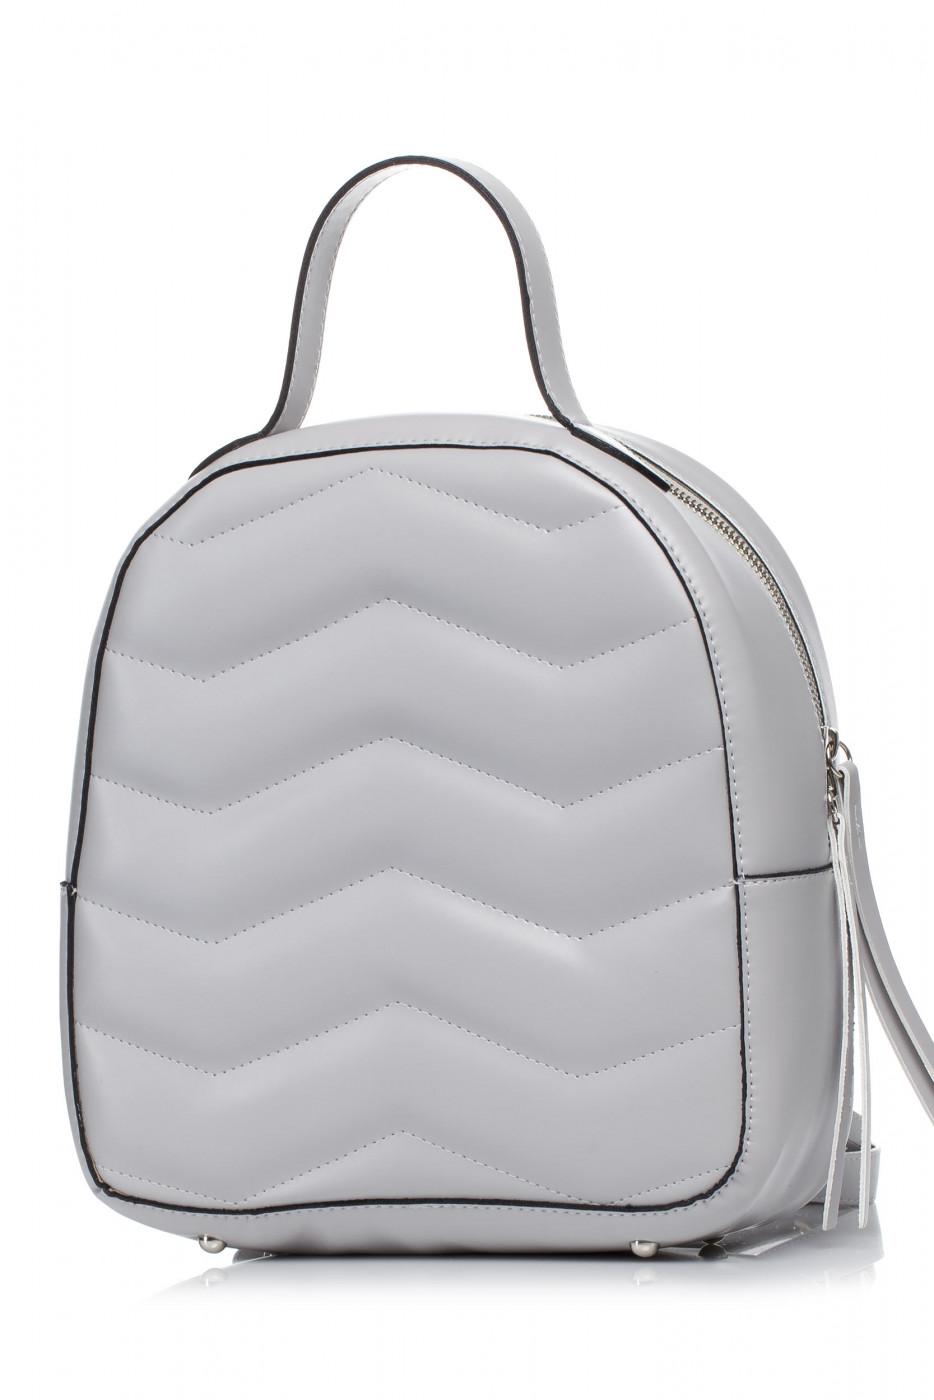 Stylove Woman's Backpack Sb377